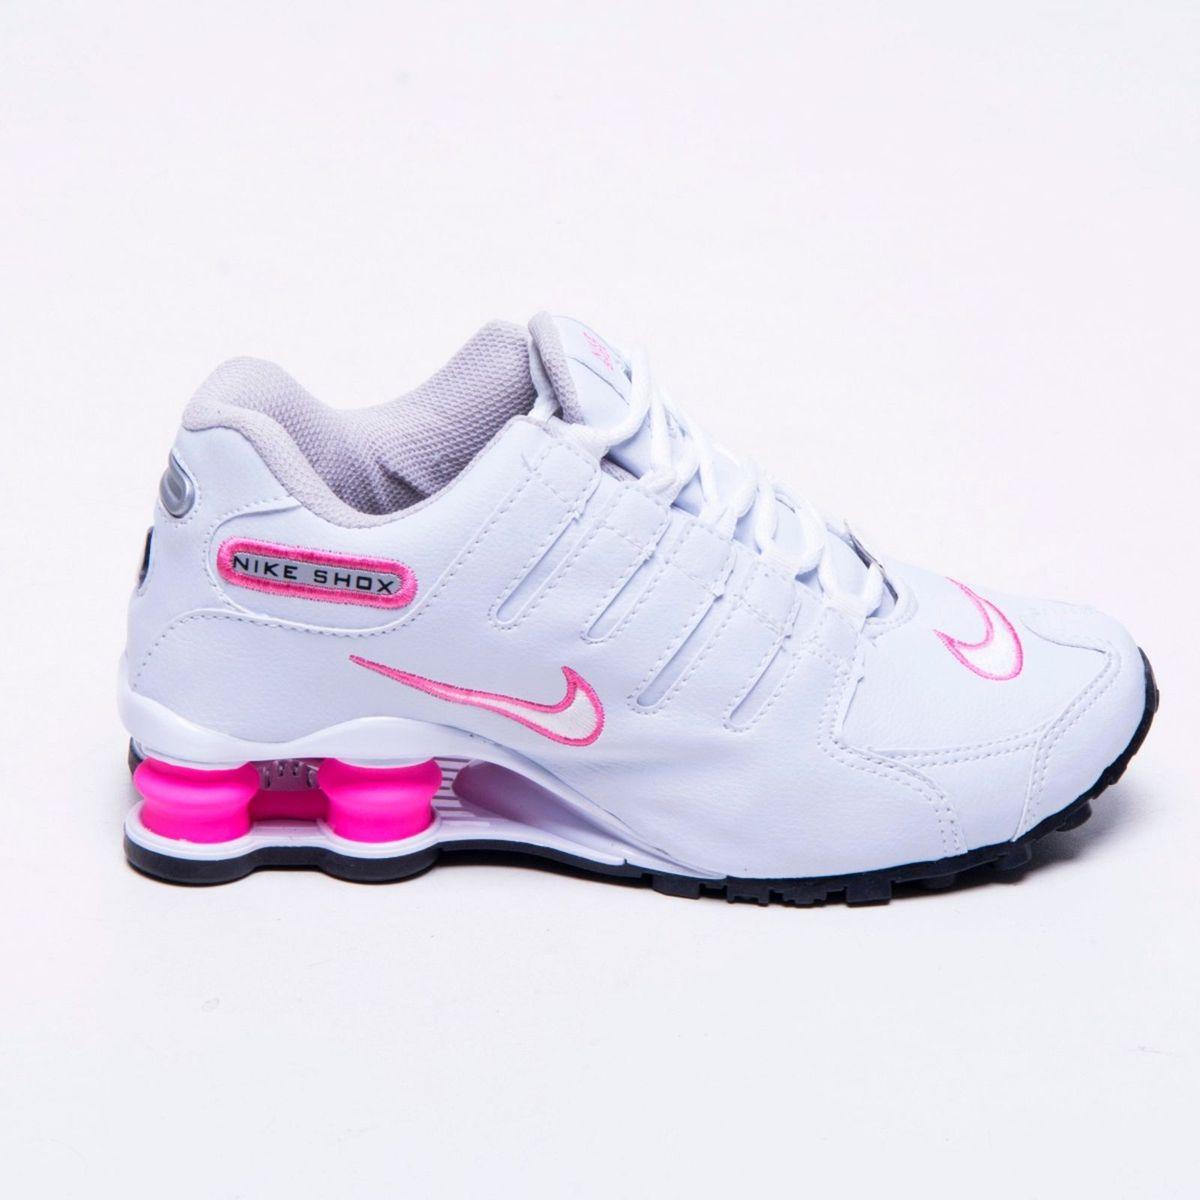 be2ef661b5cdd Tenis Nike Shox Nz Feminino Numero 35 | Tênis Feminino Nike Nunca Usado  30116379 | enjoei